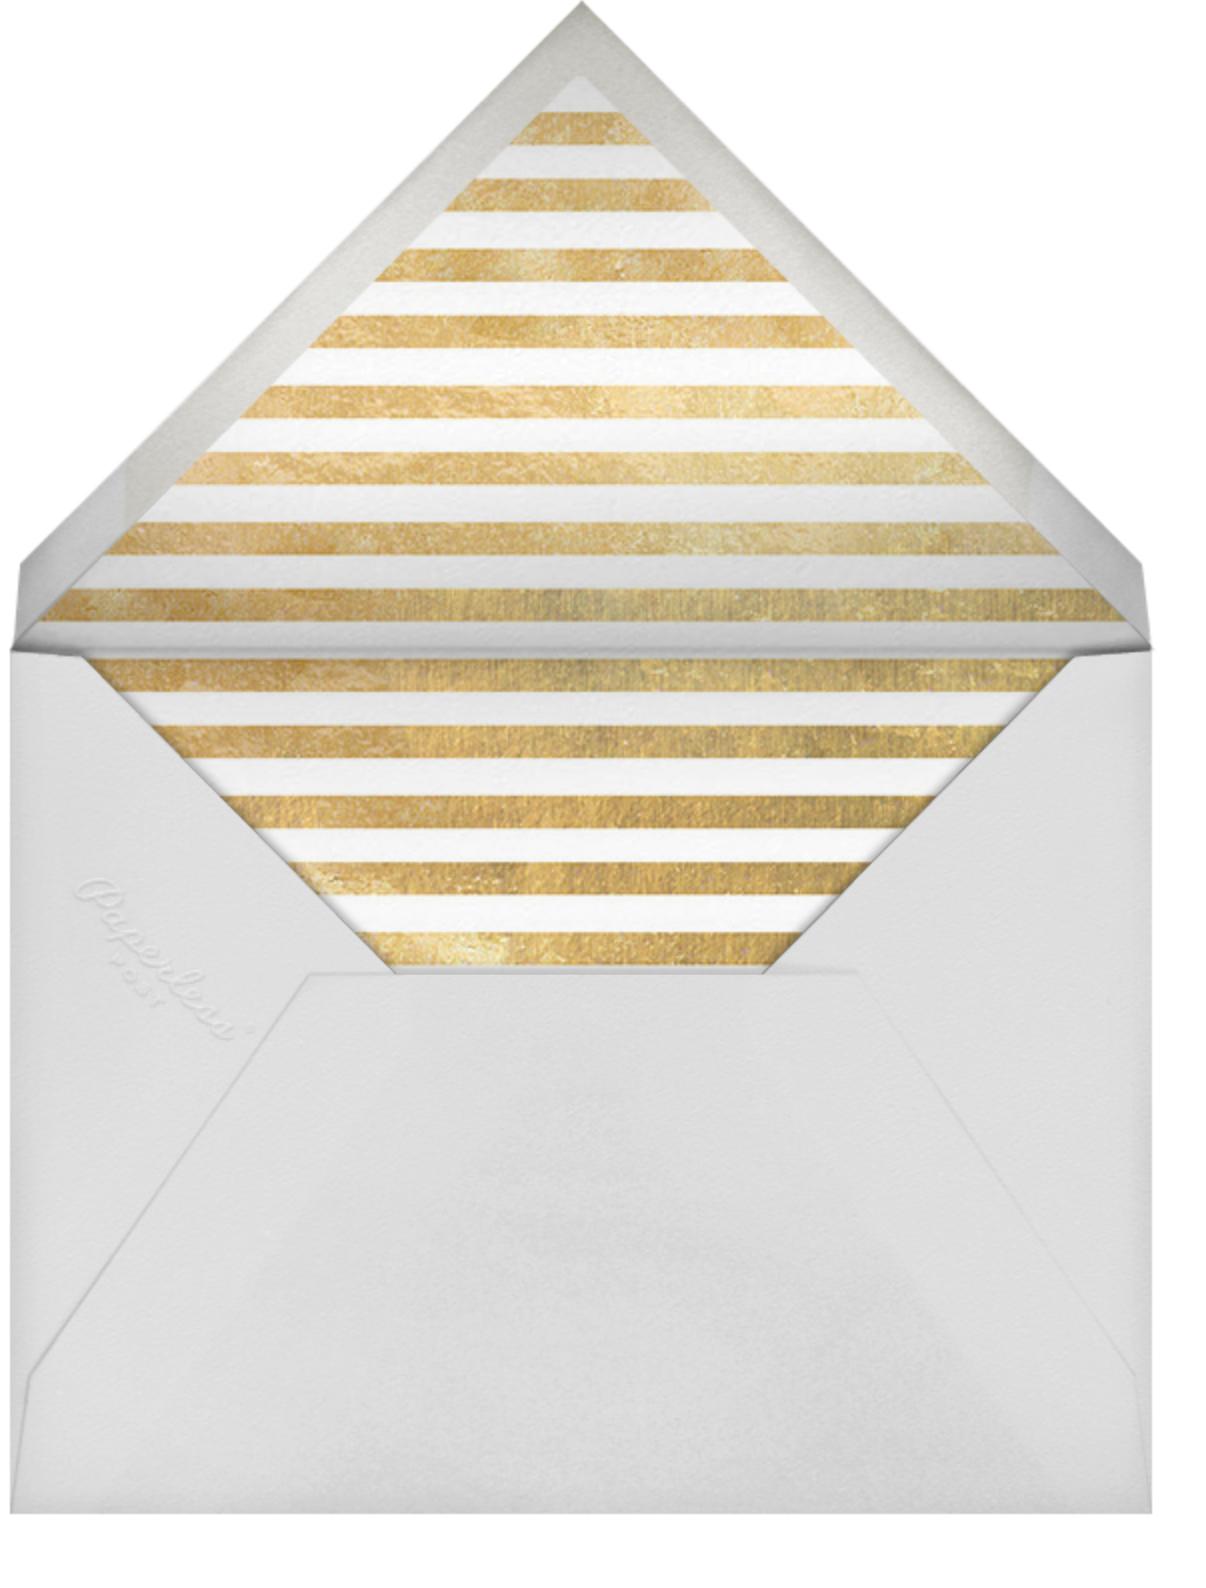 Confetti (Stationery) - Blush/Gold - kate spade new york - General - envelope back